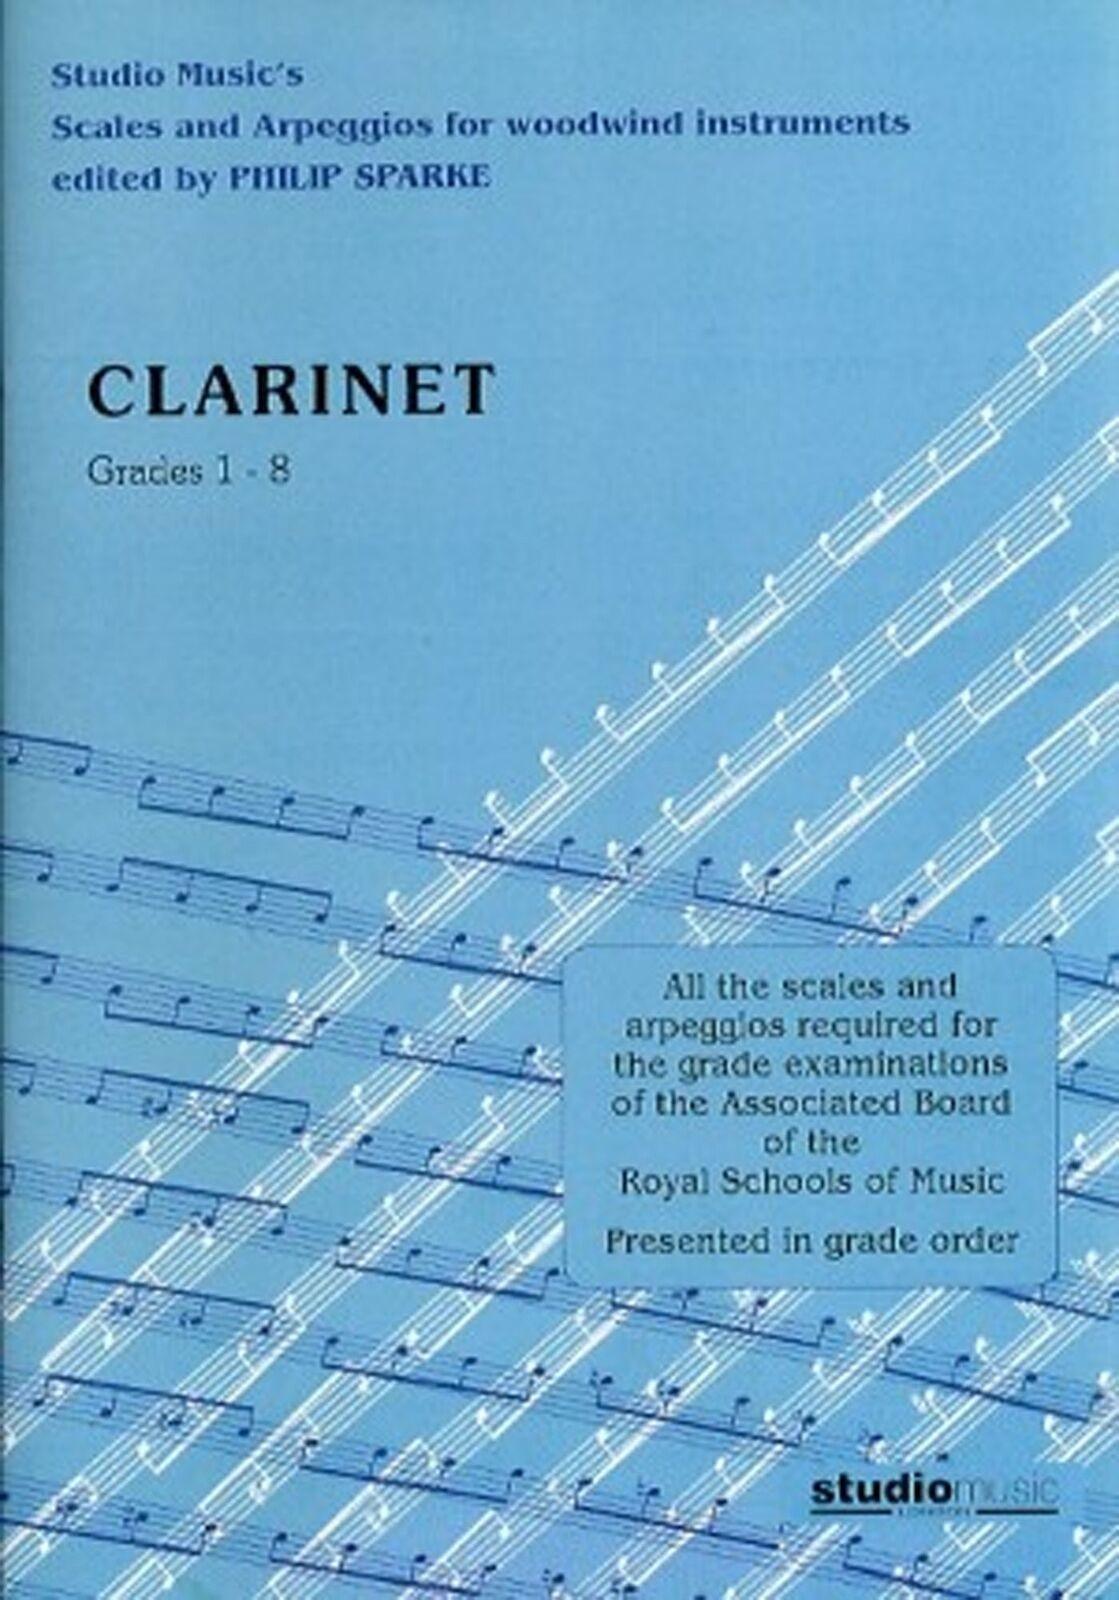 Scales And Arpeggios Clarinet Grade 1-8 ABRSM Exam Book Studio Music S158